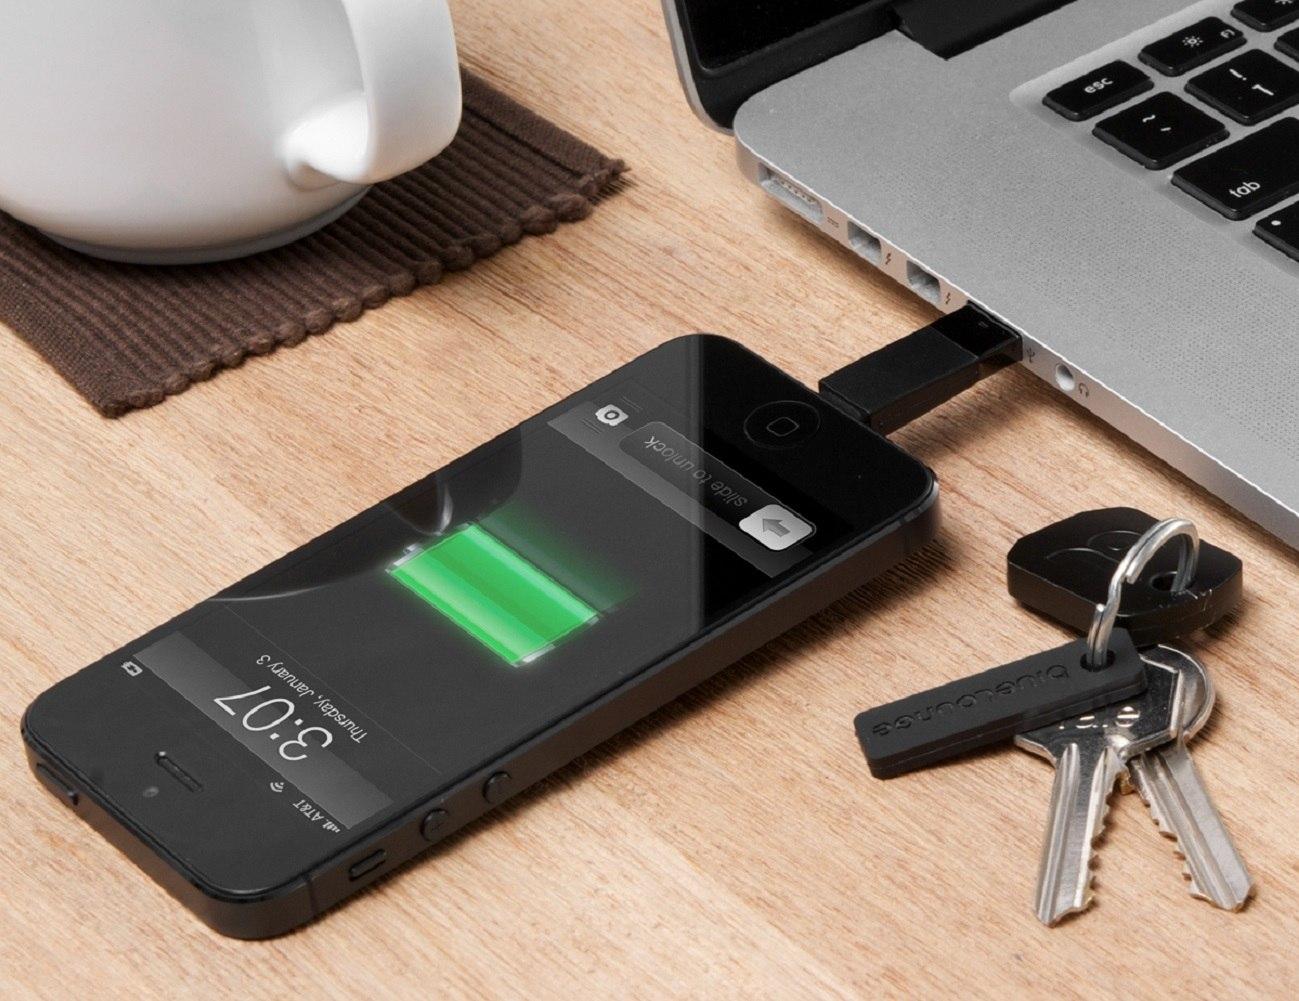 Kii iPhone Keychain Charger